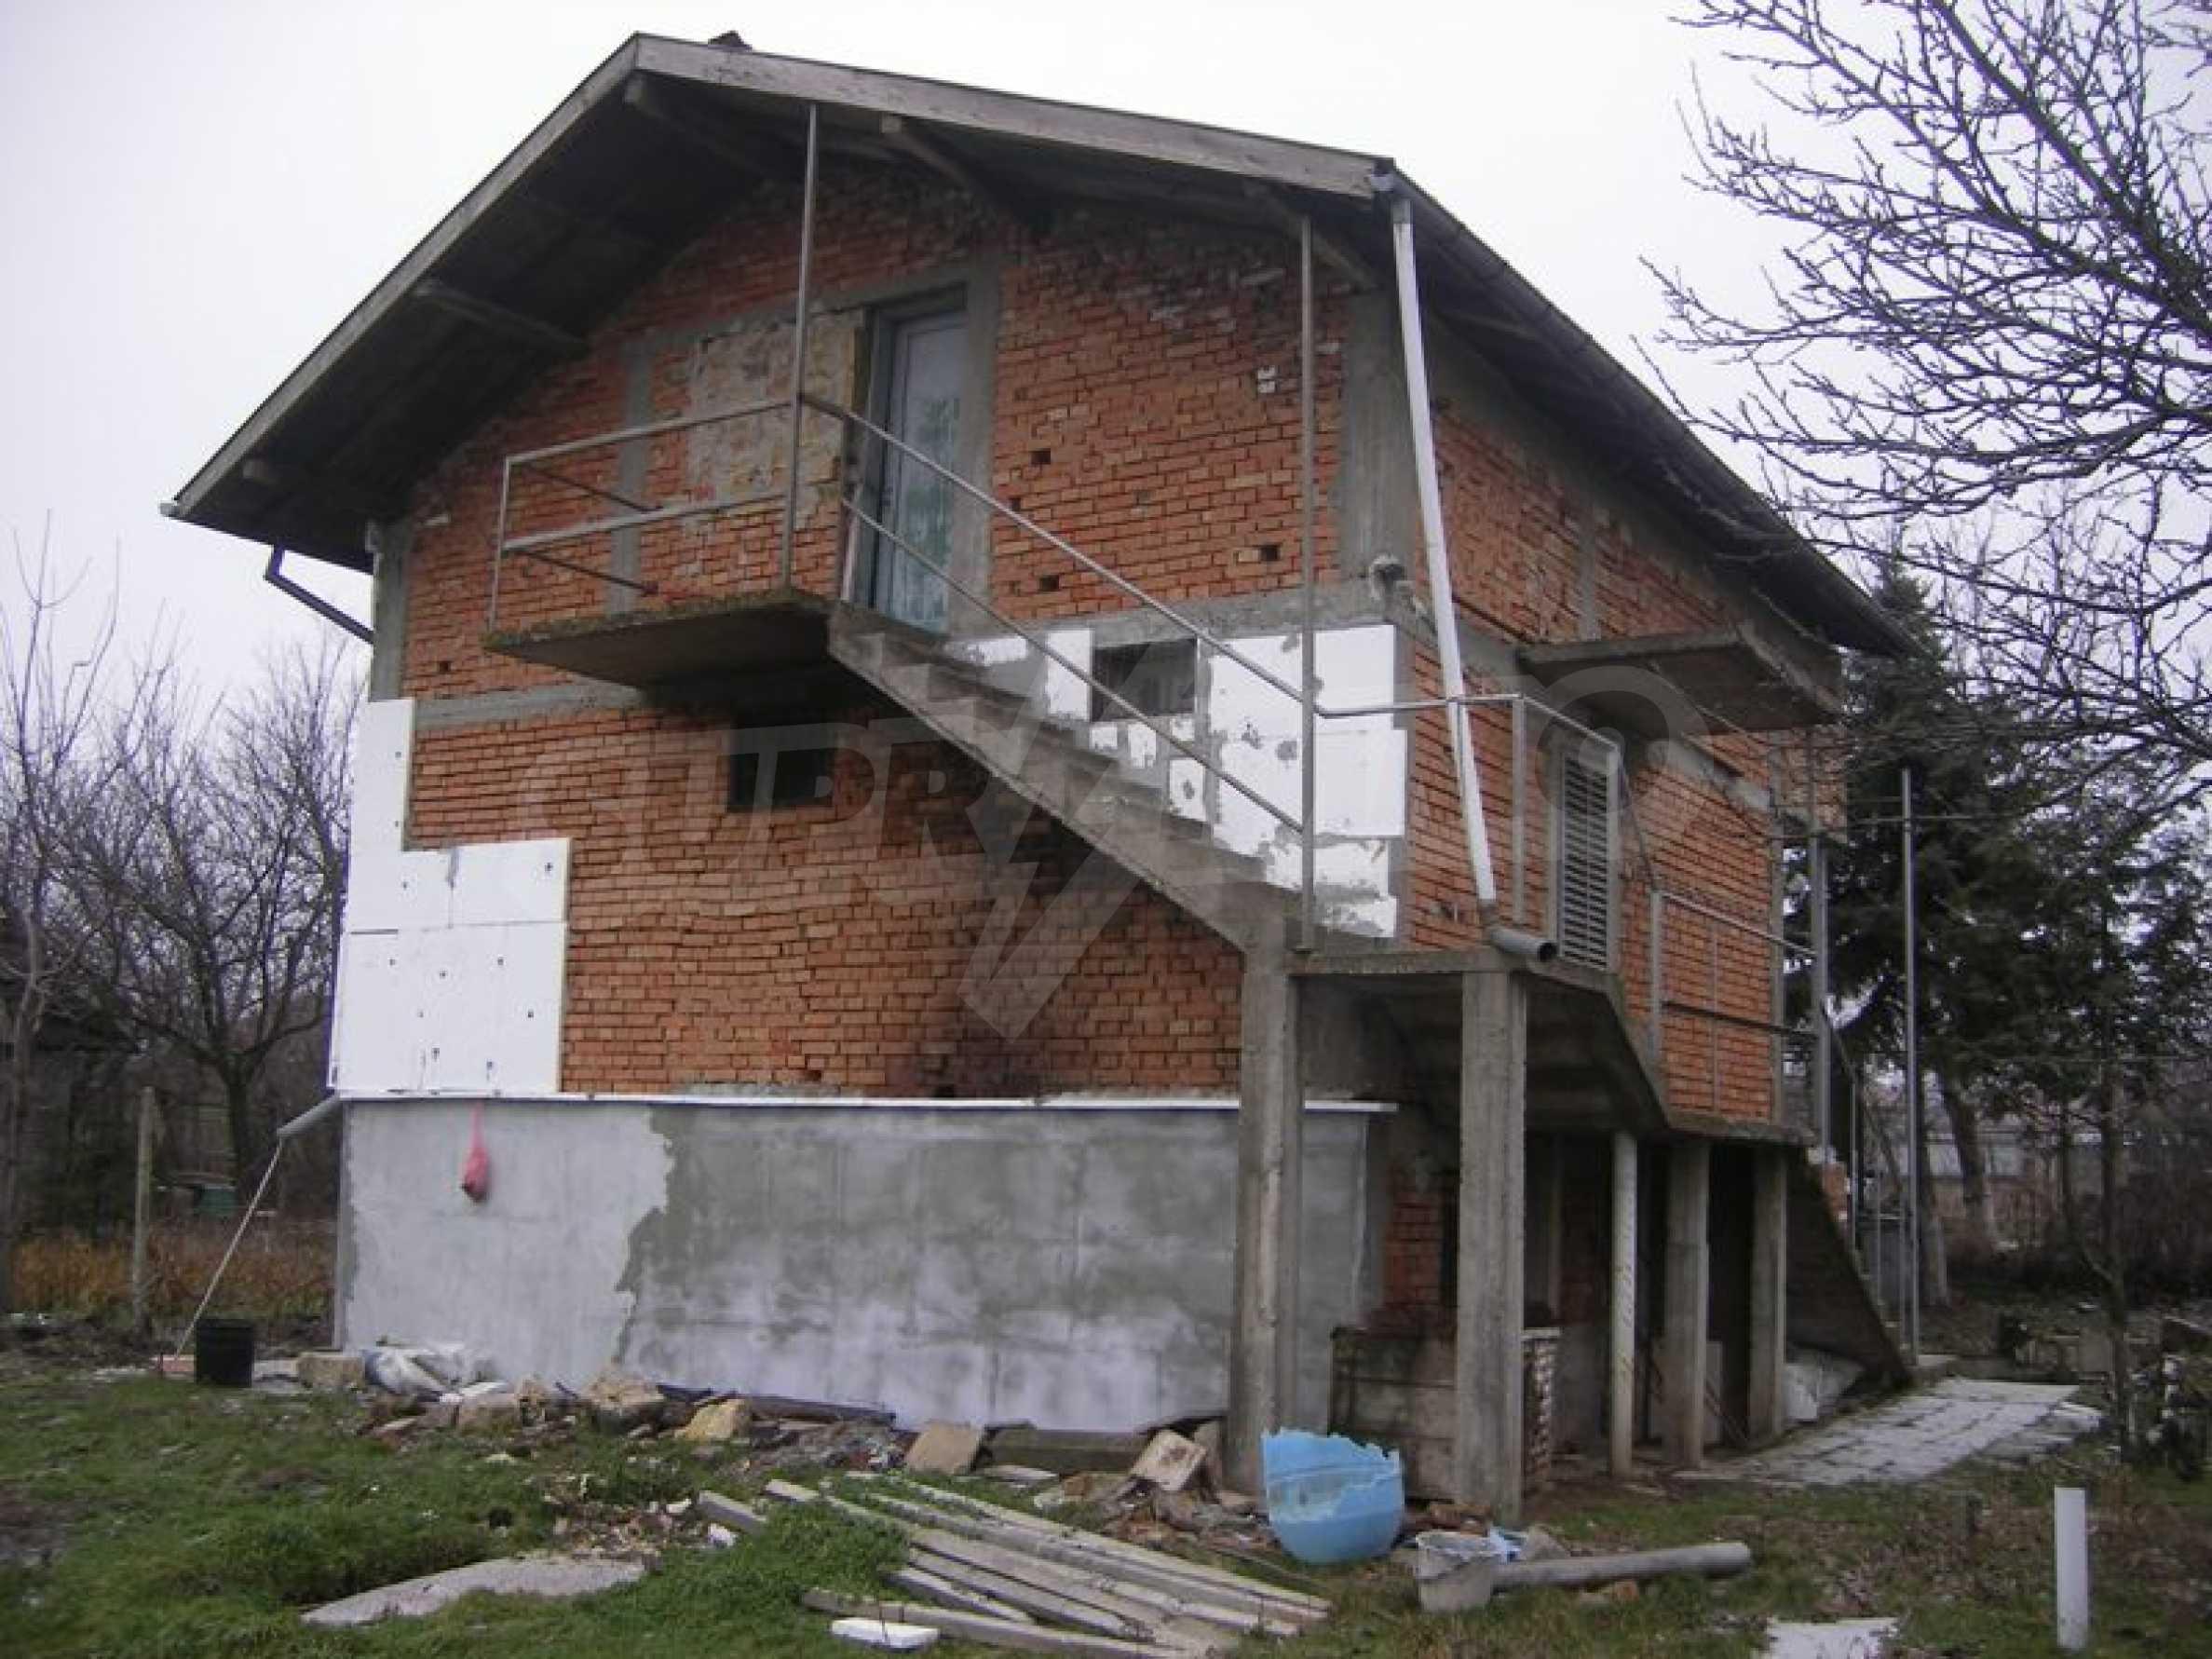 House for sale in Shtarklevo village 3